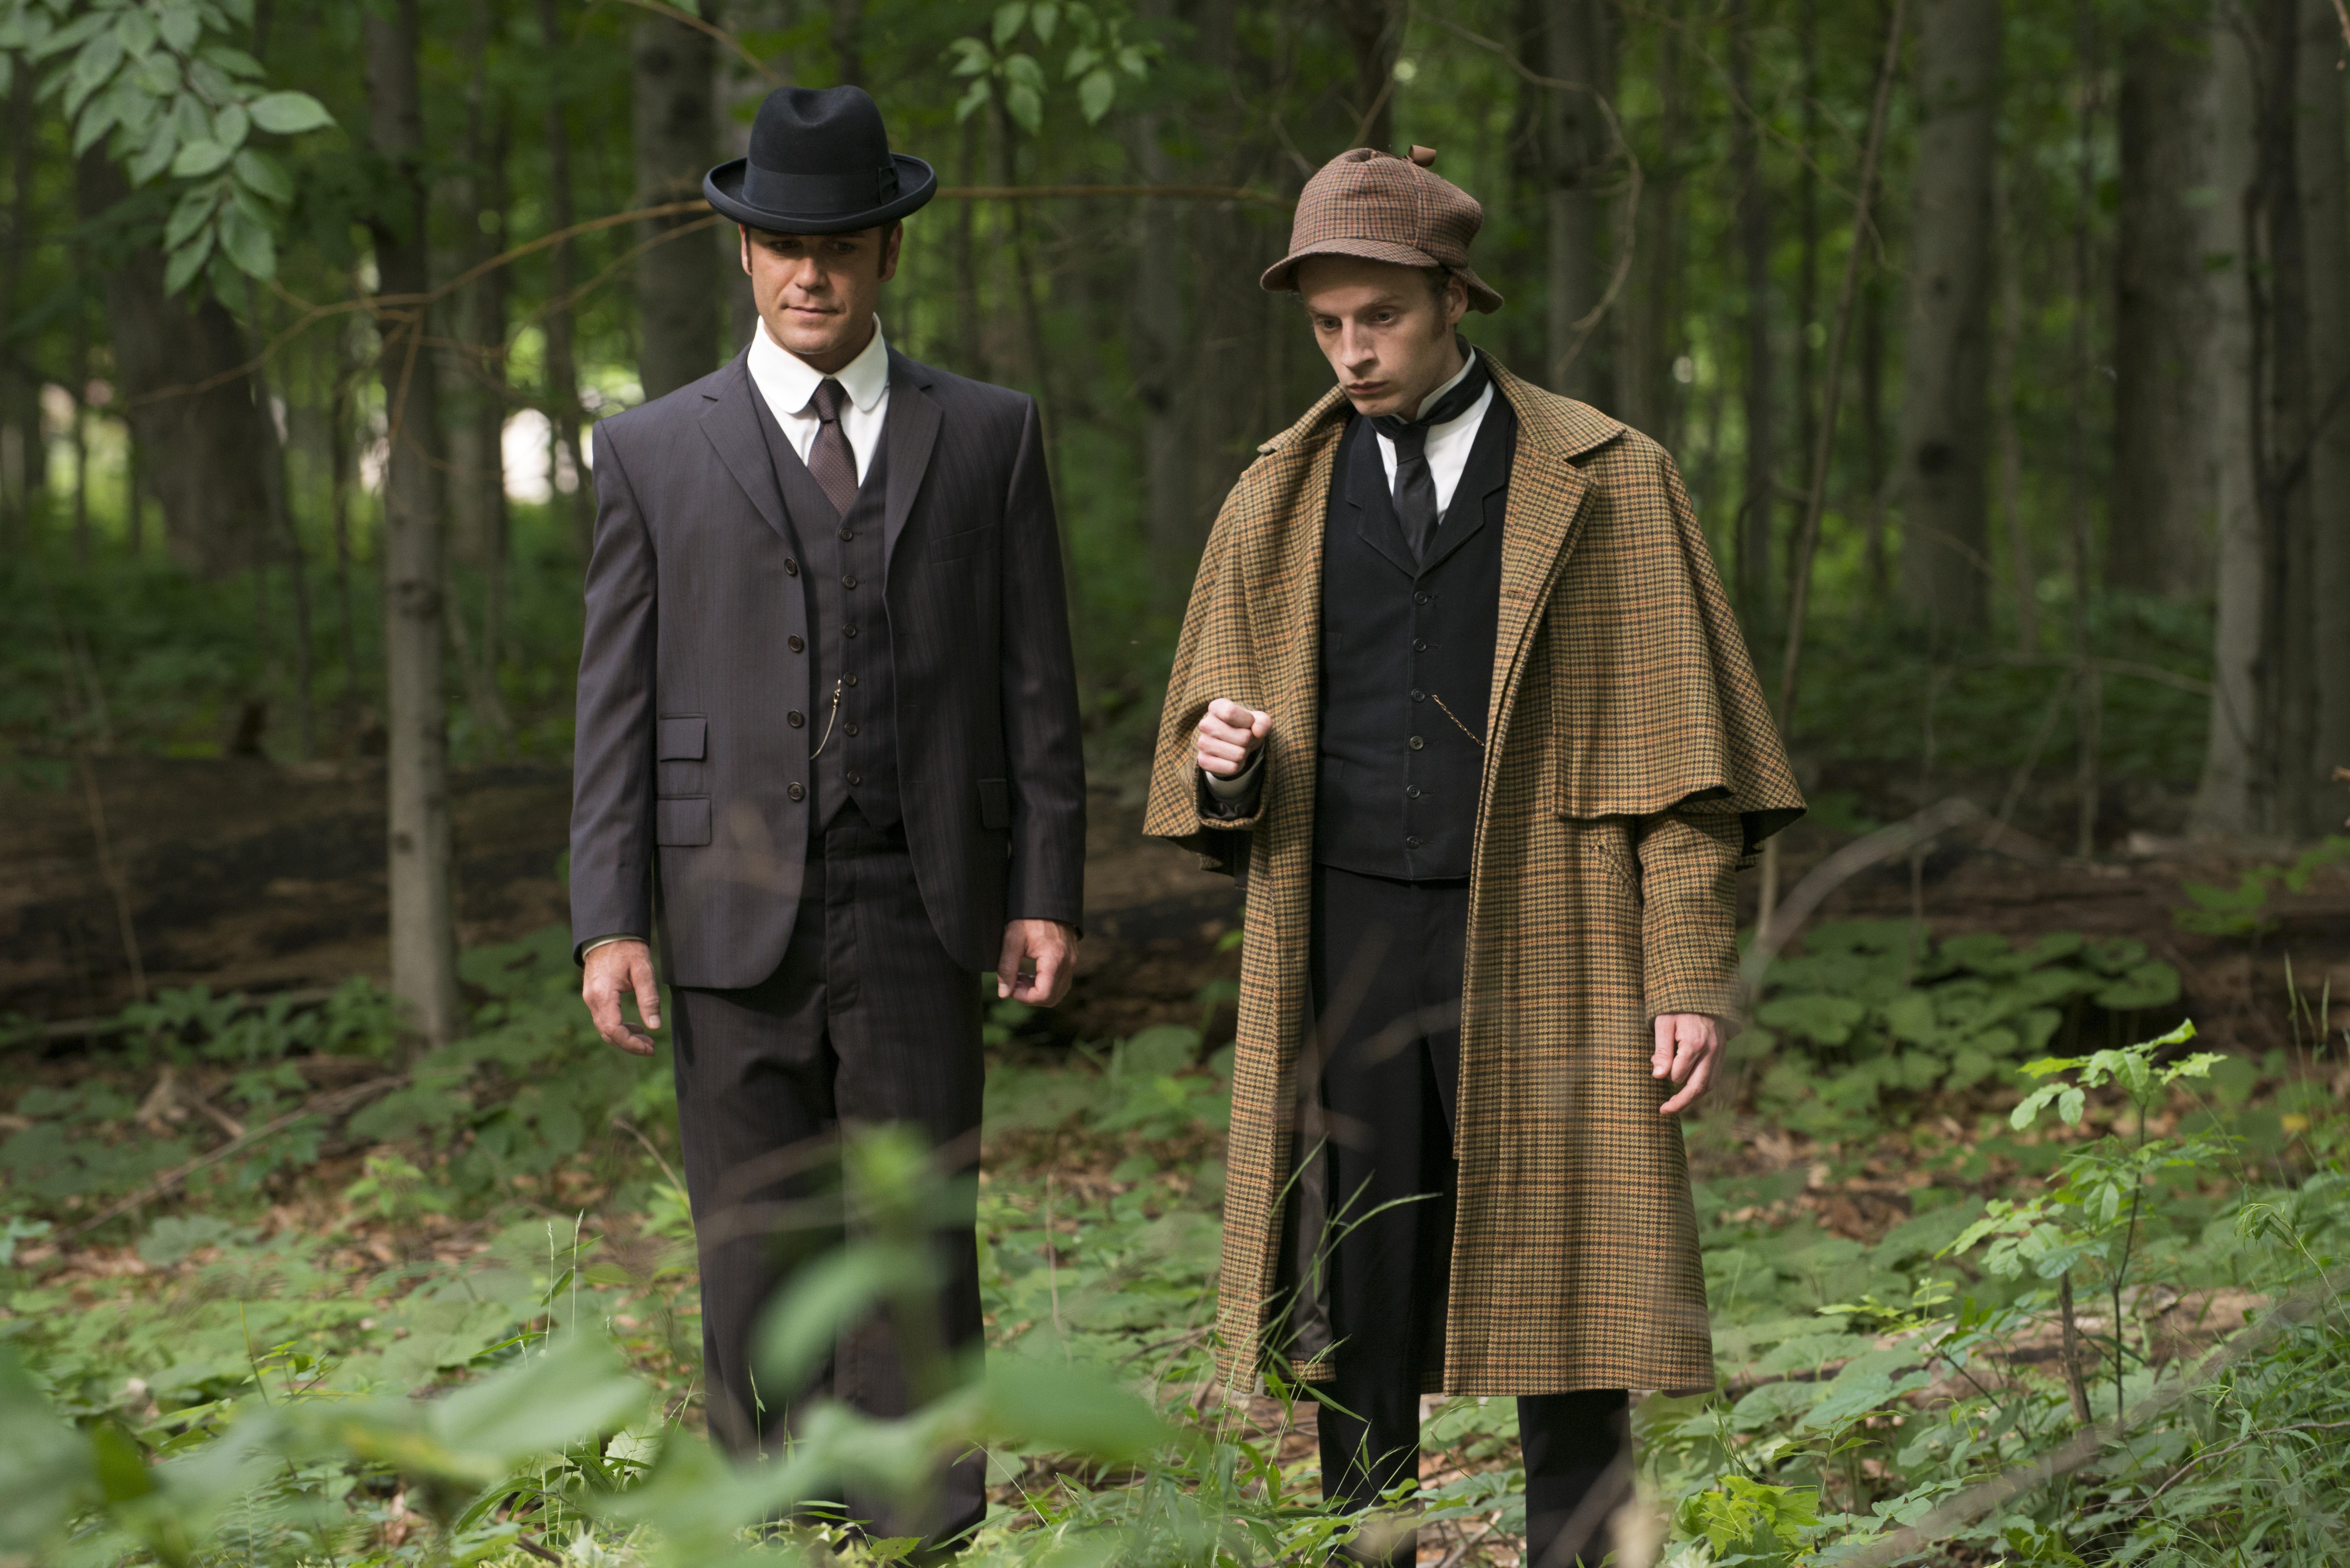 Detective Murdoch and Sherlock Holmes